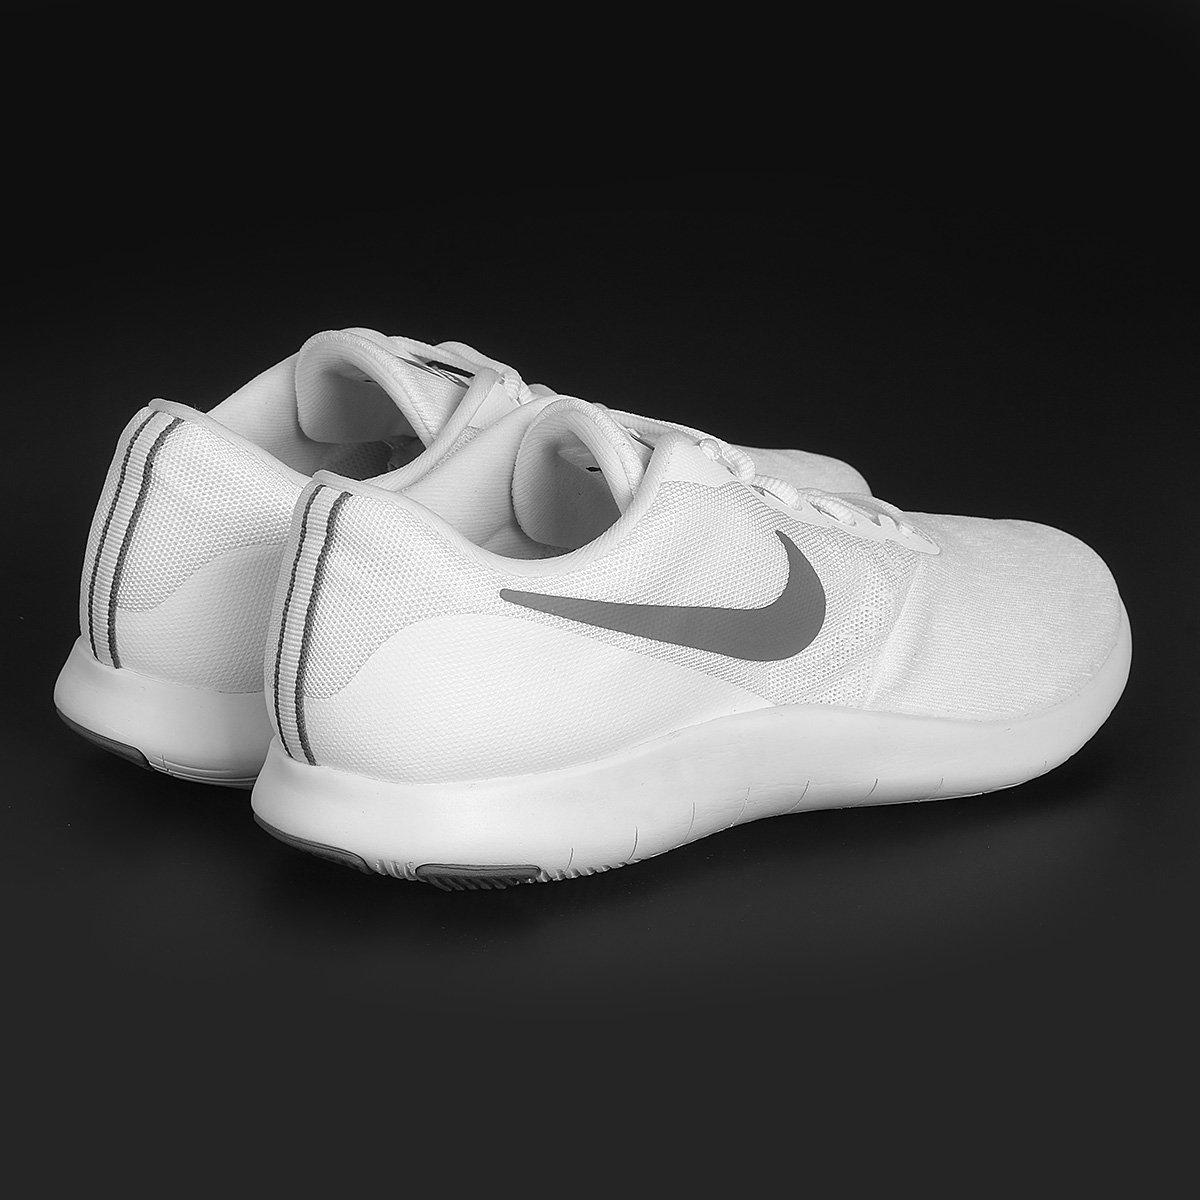 504b52adc1f1d Tênis Nike Flex Contact Masculino - Branco e Cinza - Compre Agora ...  f16fd1b1b0b333 ...